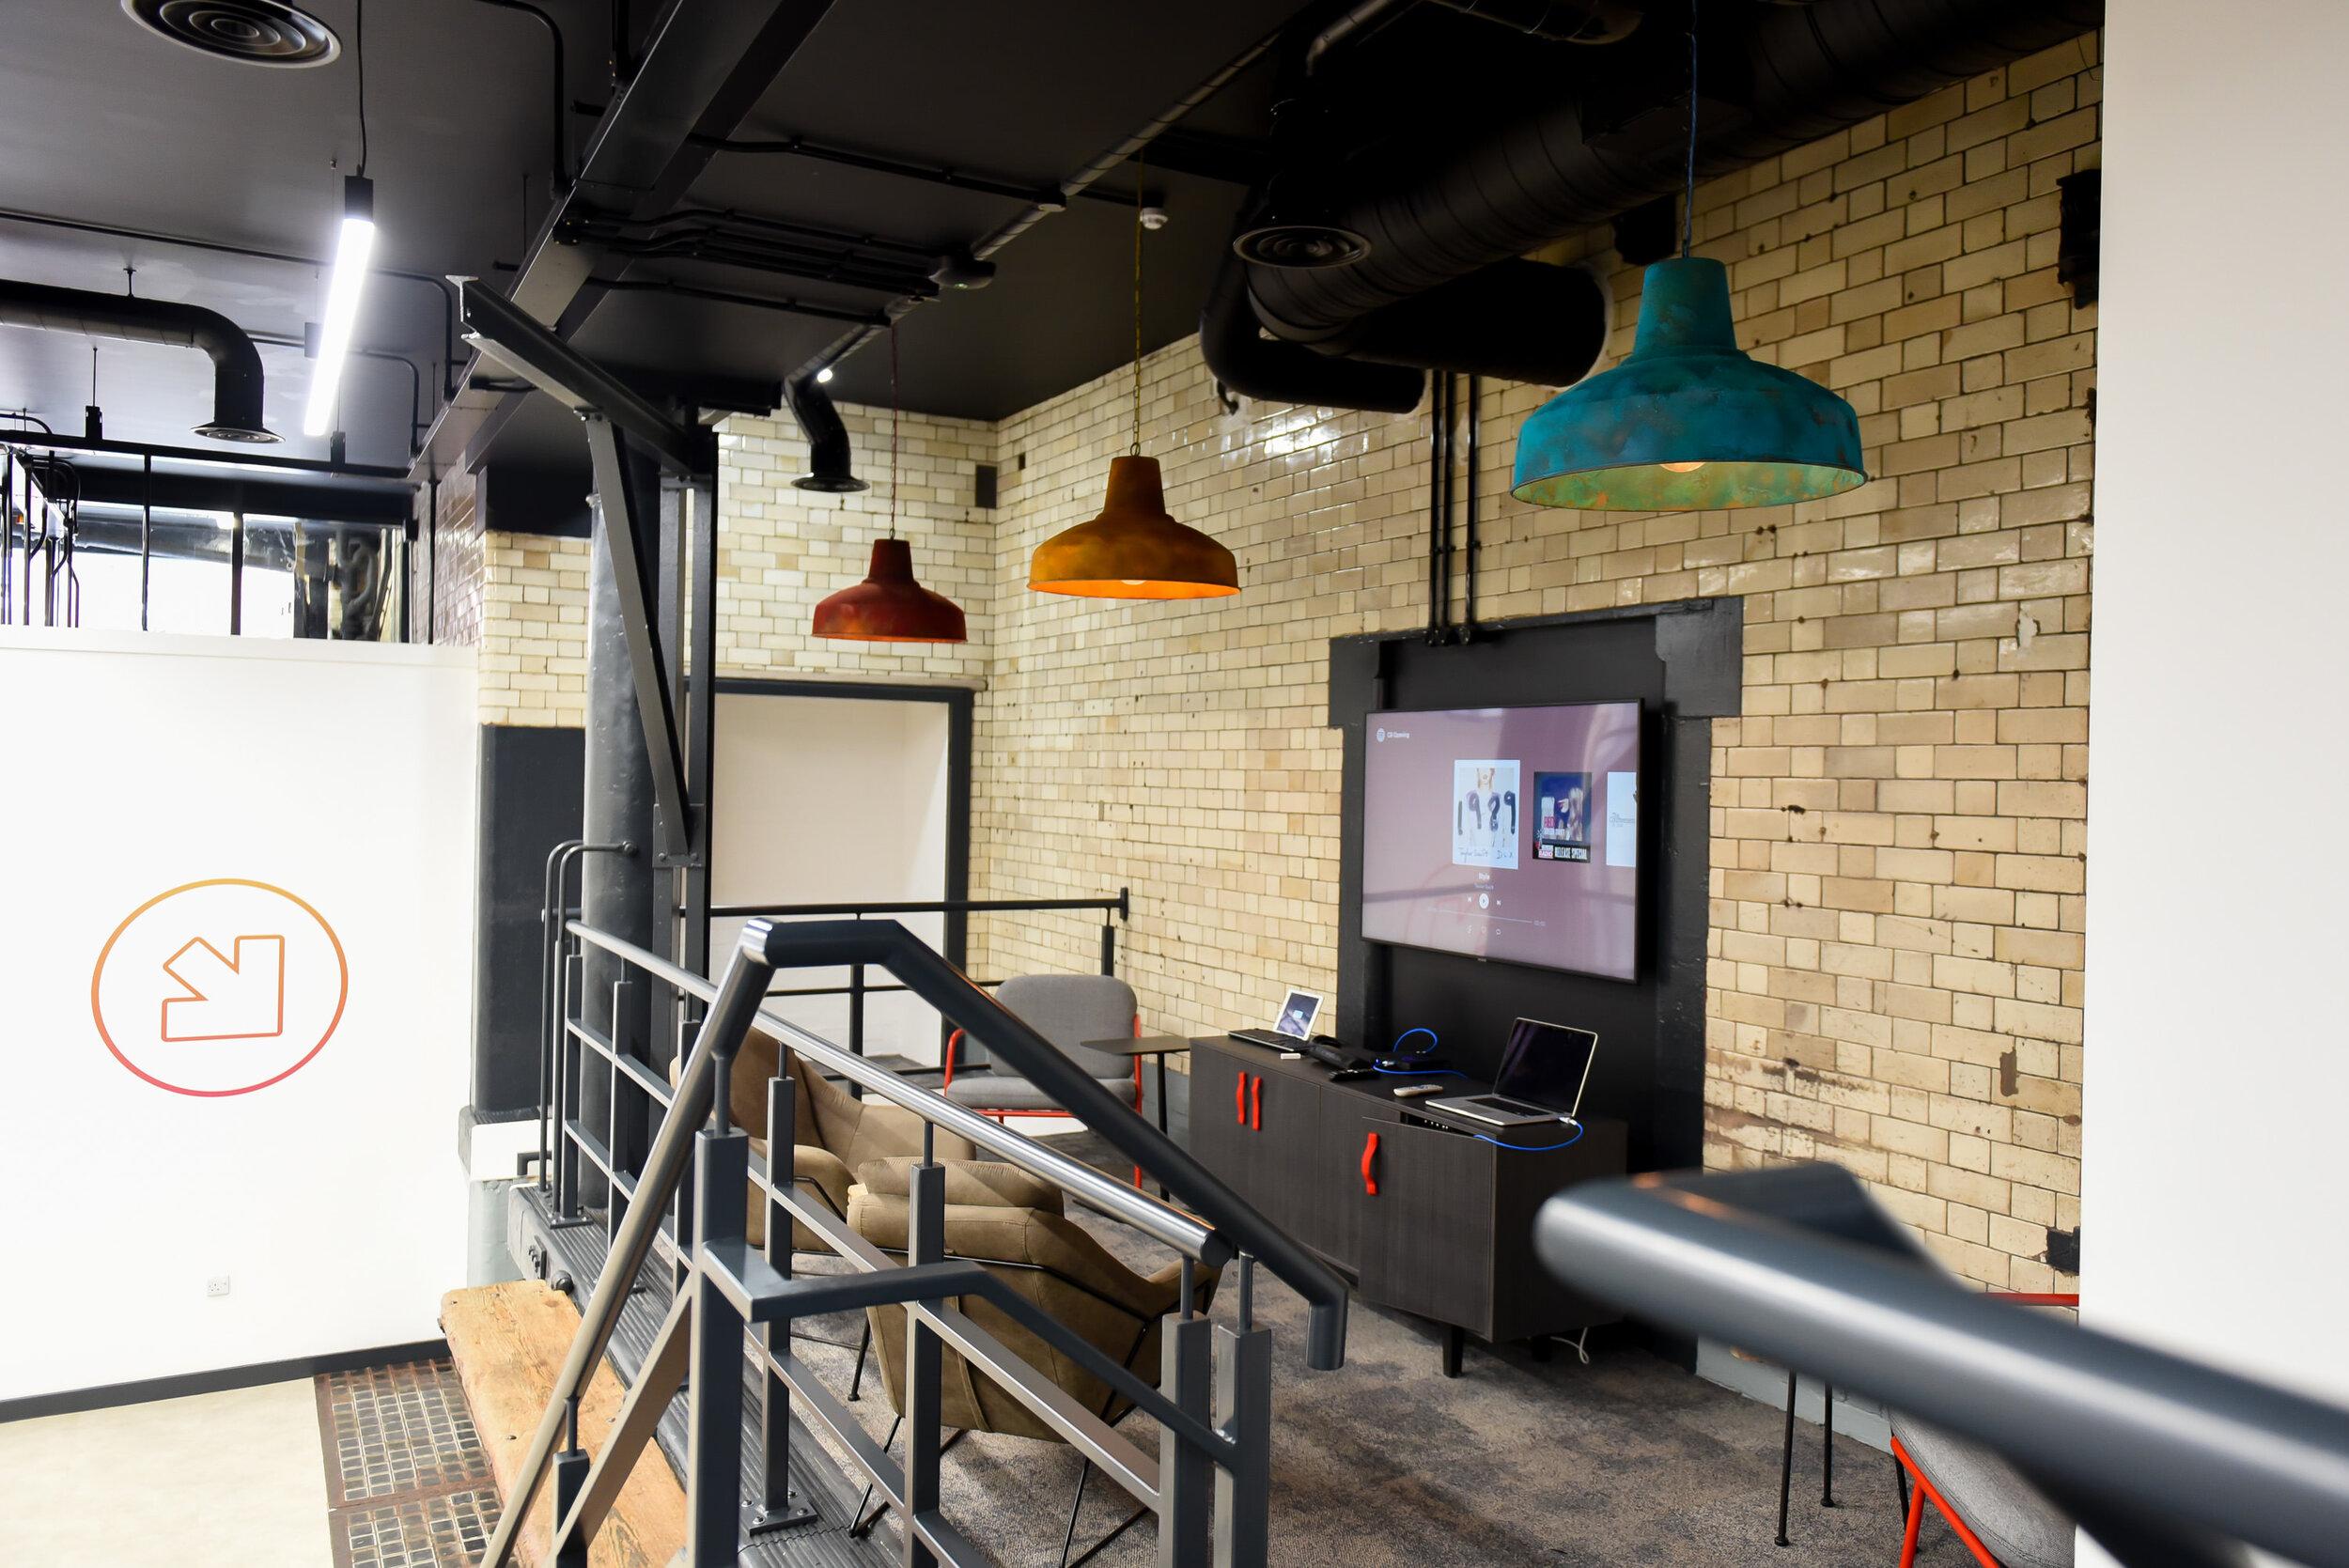 Couchbase_officelaunch_6.jpg